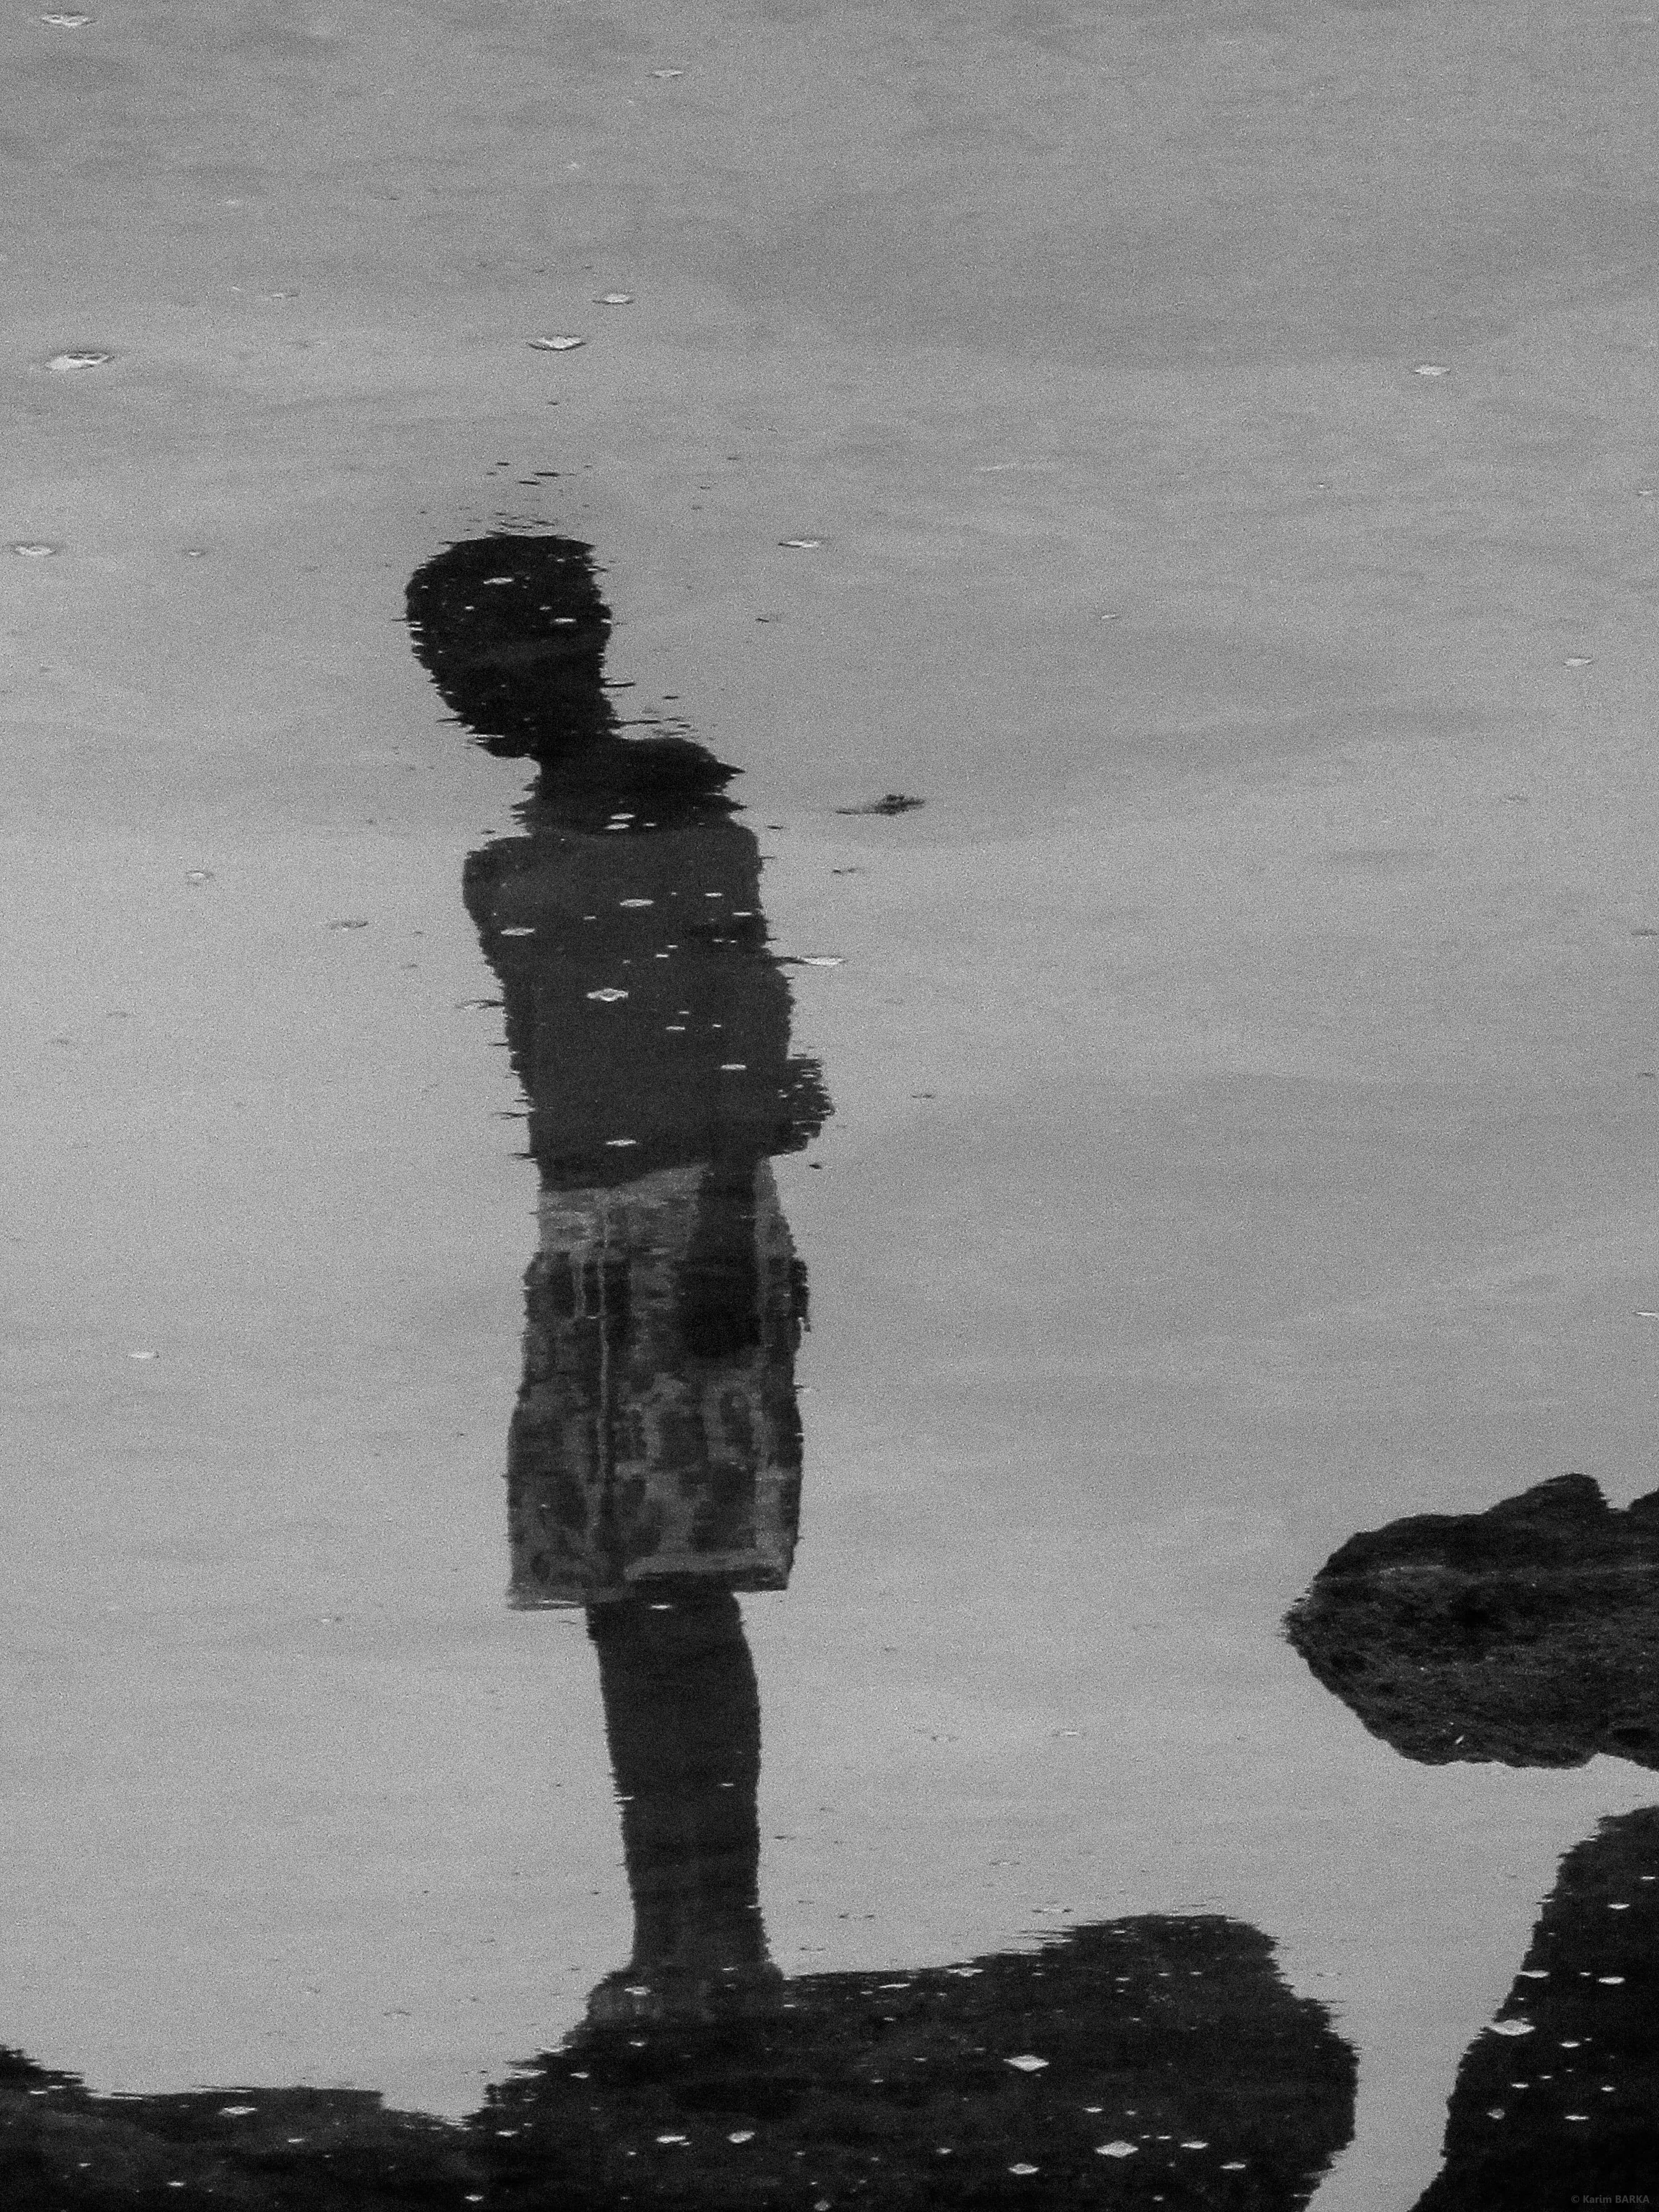 Karim Barka, water nomad